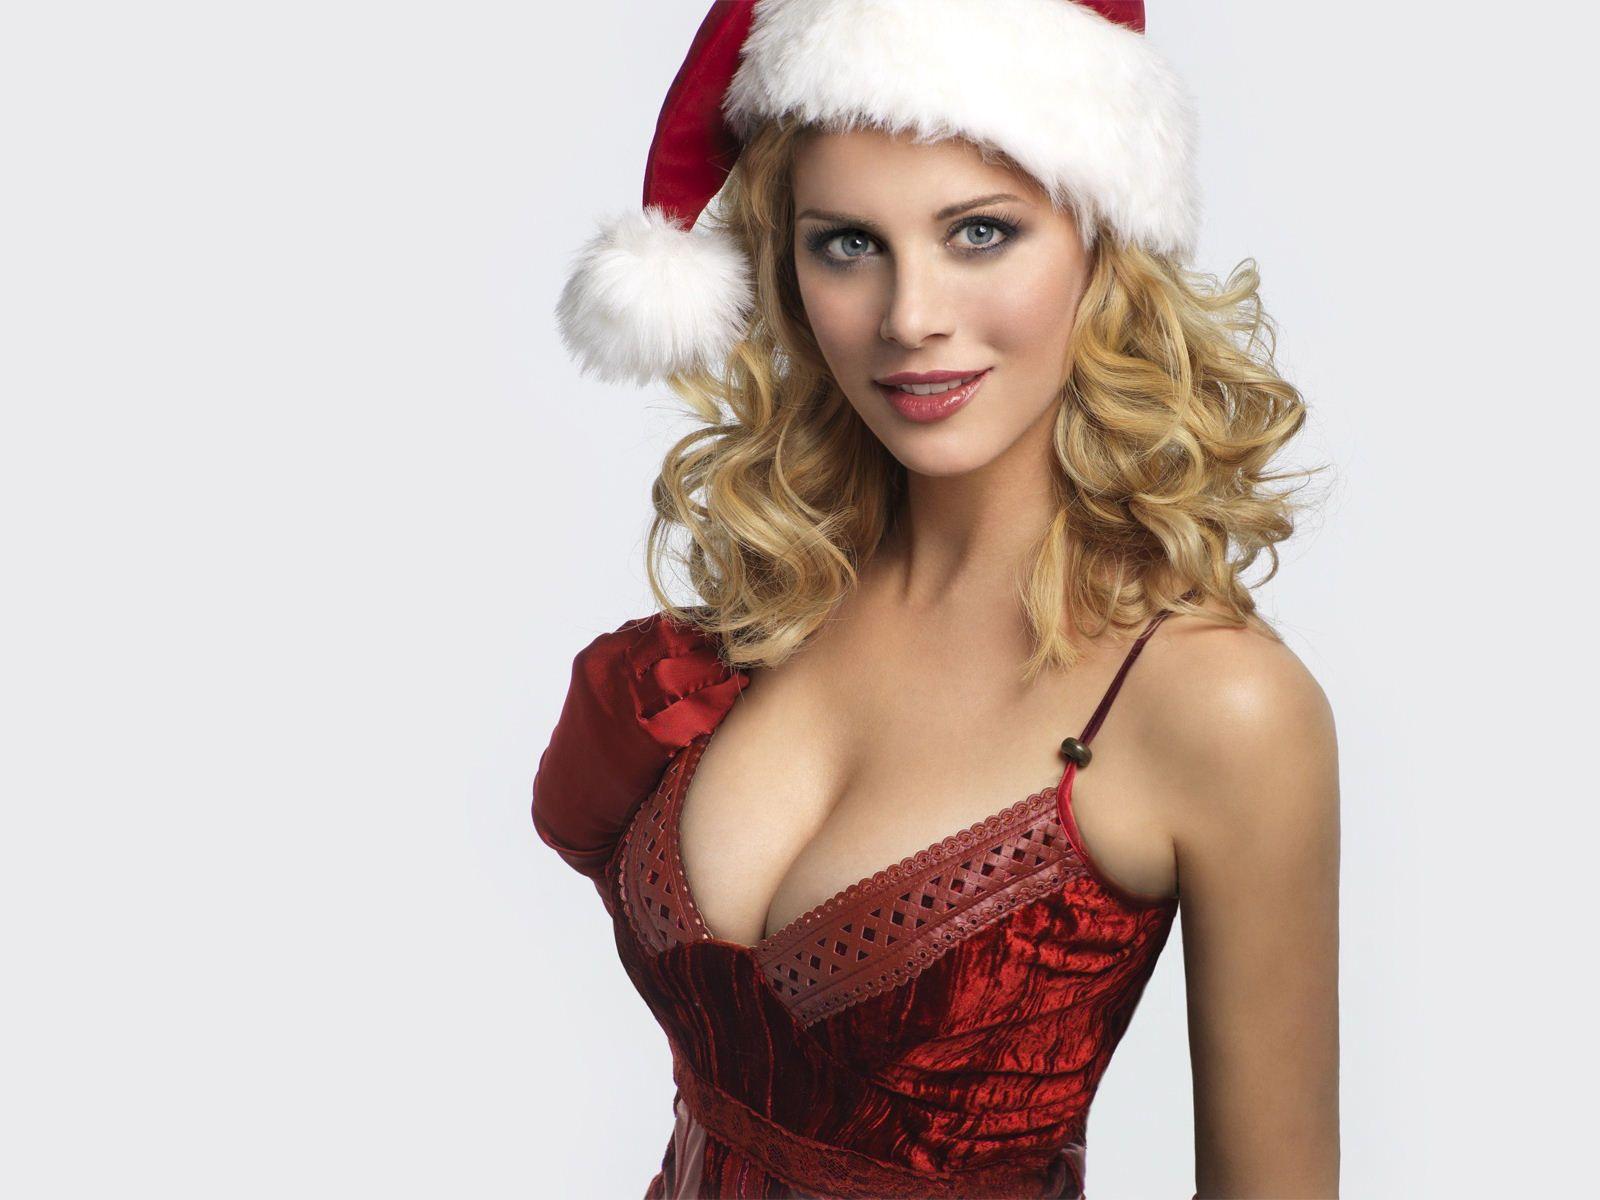 playboy christmas wallpapers   Eva Habermann, Celebrity